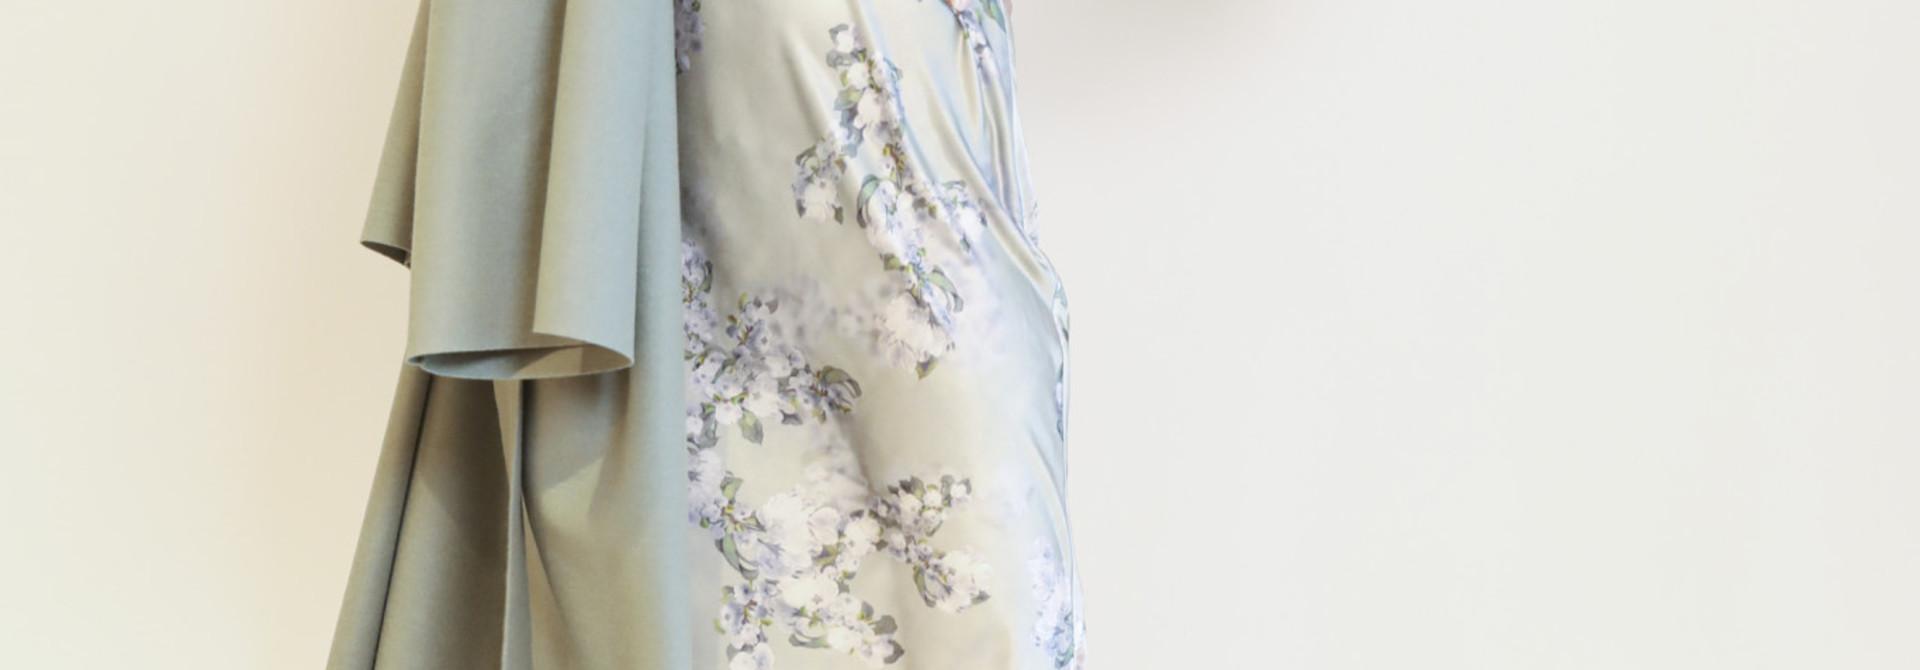 Hazy blossom cowl nk slip dress